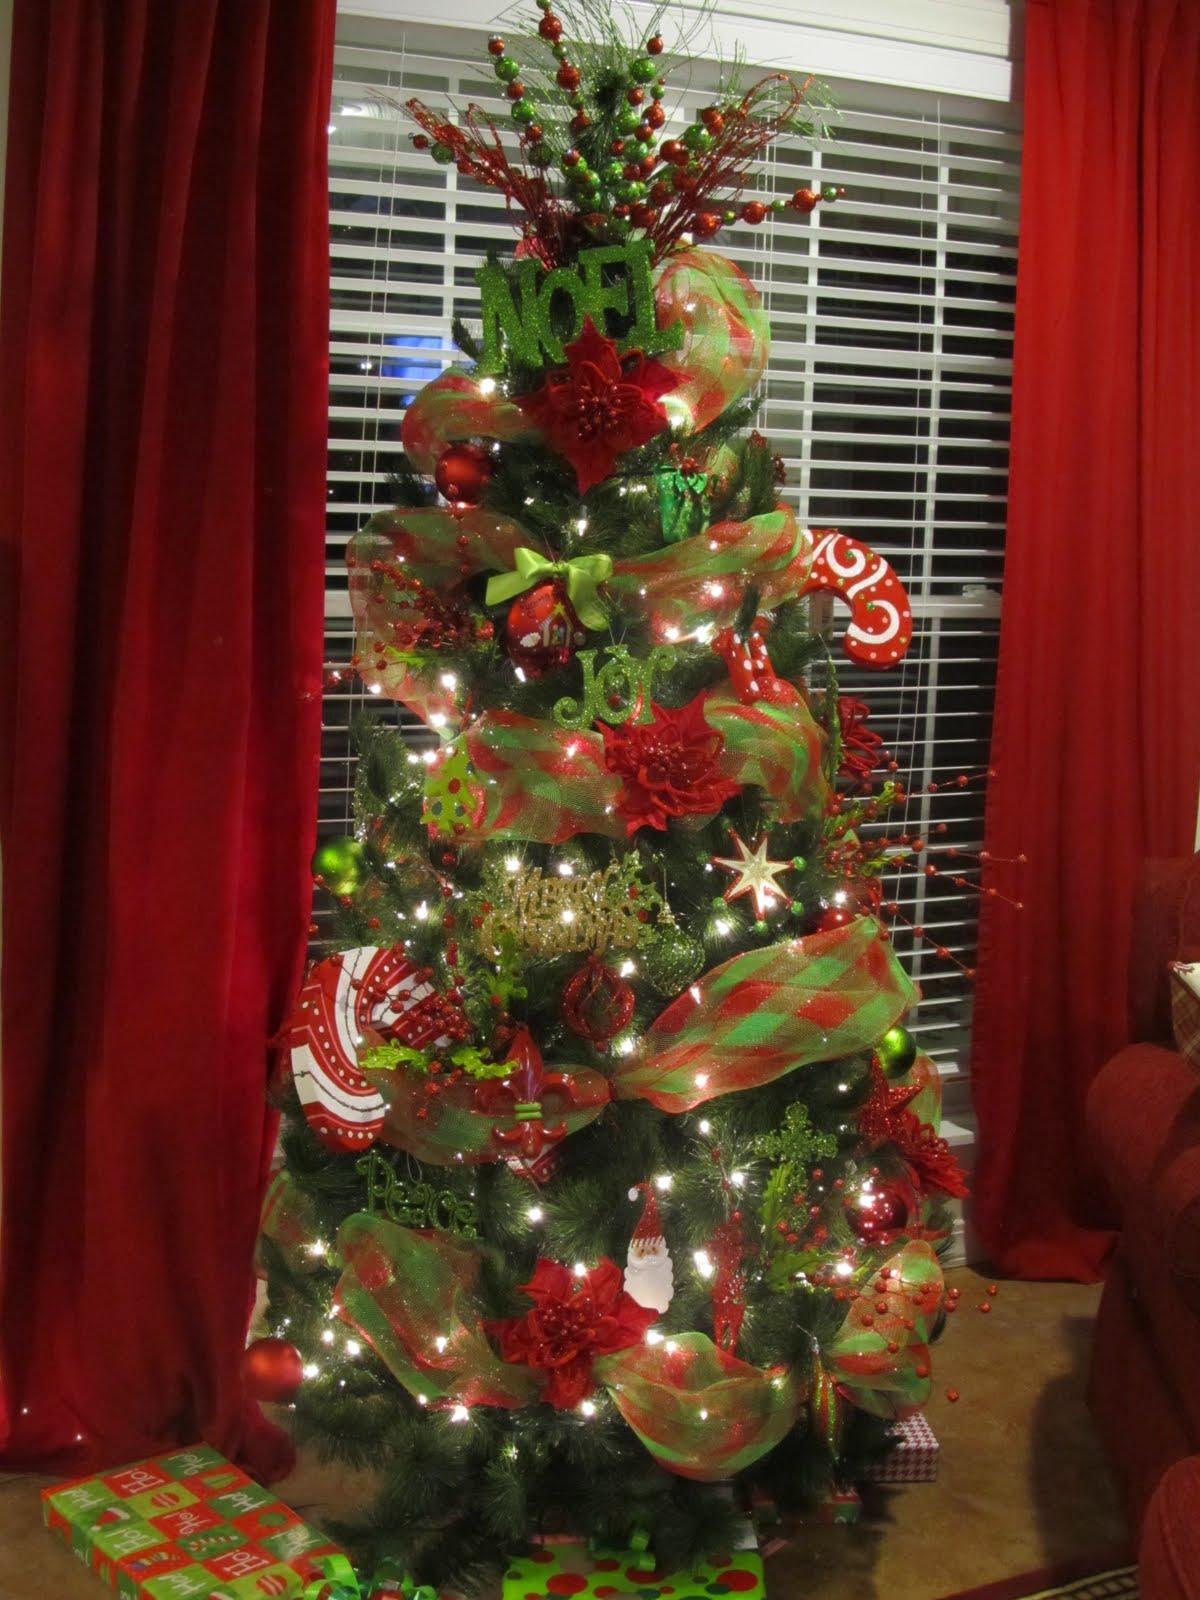 miss janice 2011 parade of christmas trees part 1 - Elf Legs Christmas Decoration